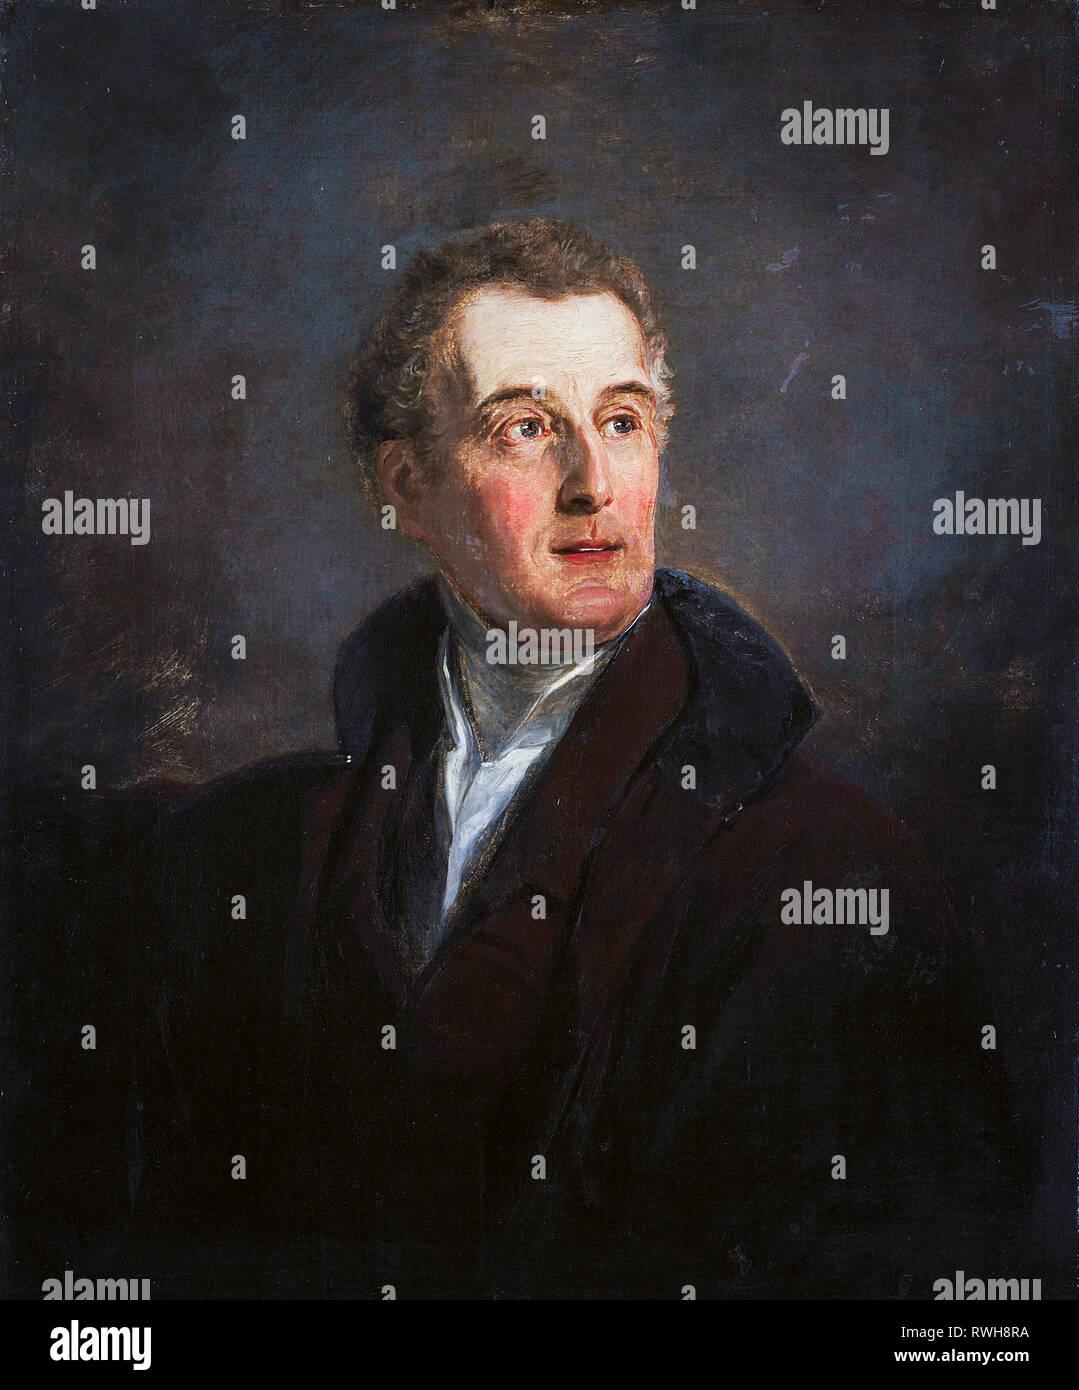 Arthur Wellesley, duque de Wellington (1769-1852), retrato de 1821, por Jan Willem Pieneman Foto de stock